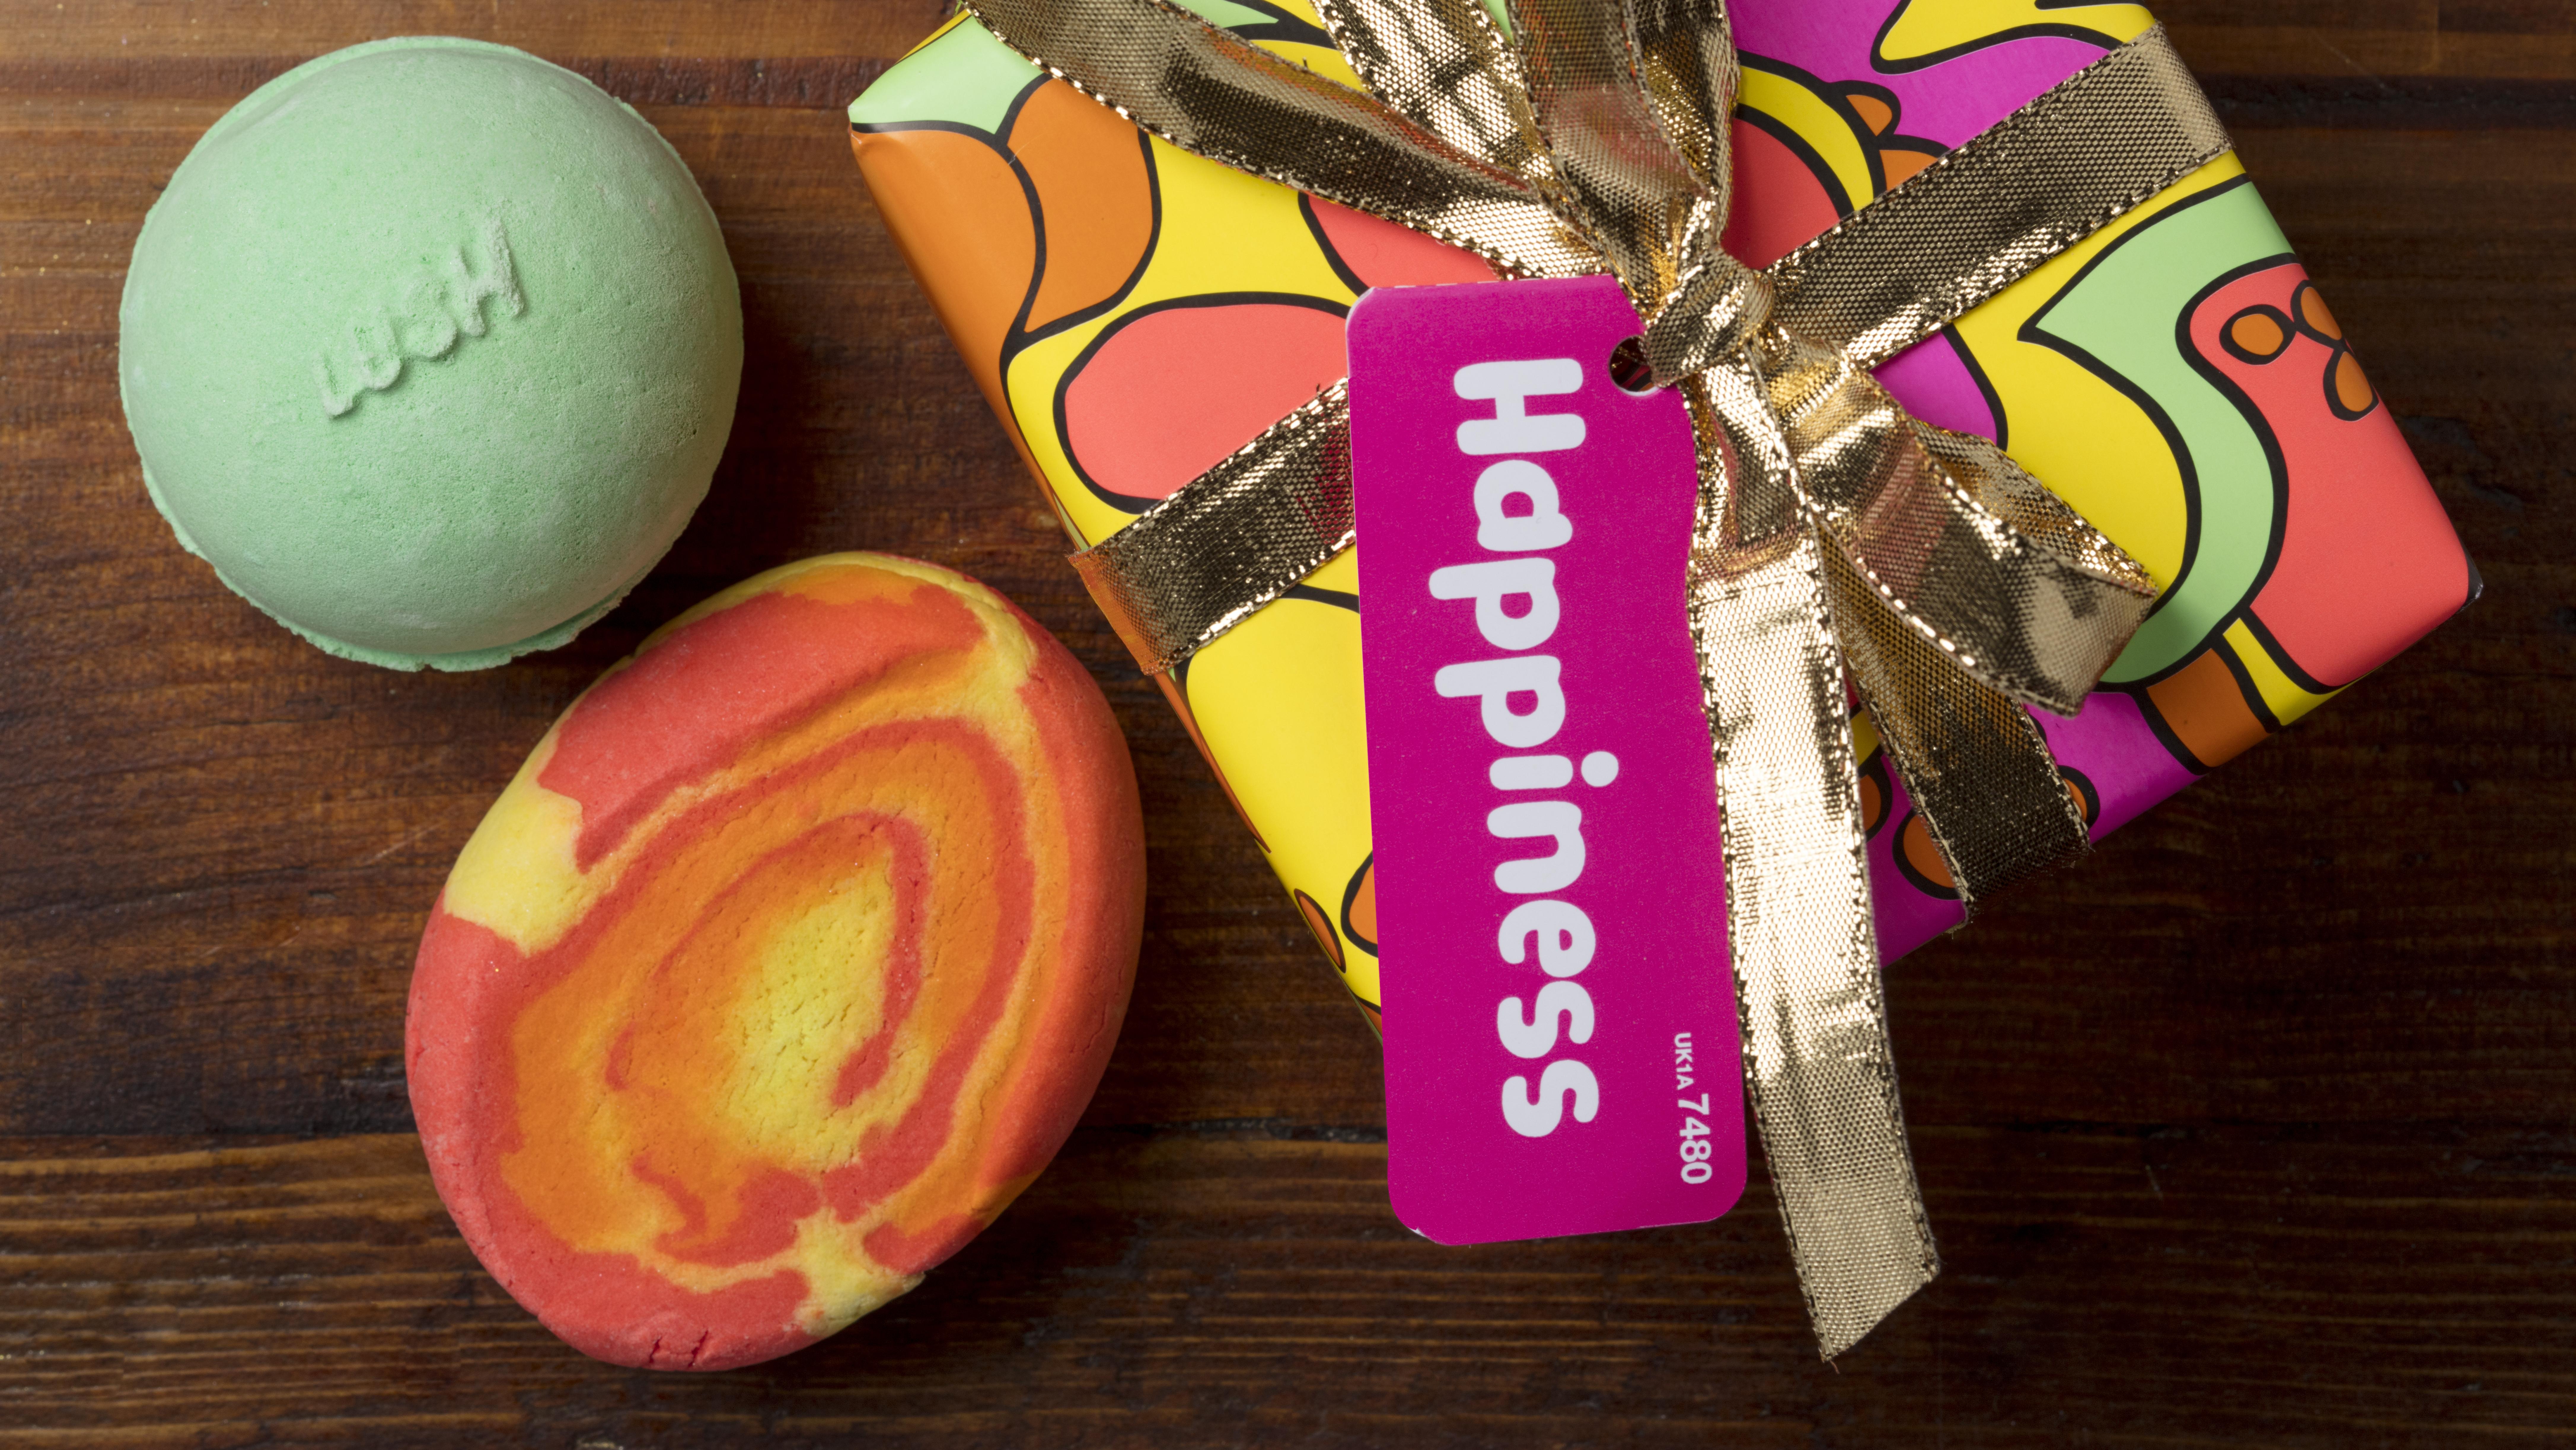 Happiness gifts under 15 lush fresh handmade cosmetics uk negle Image collections